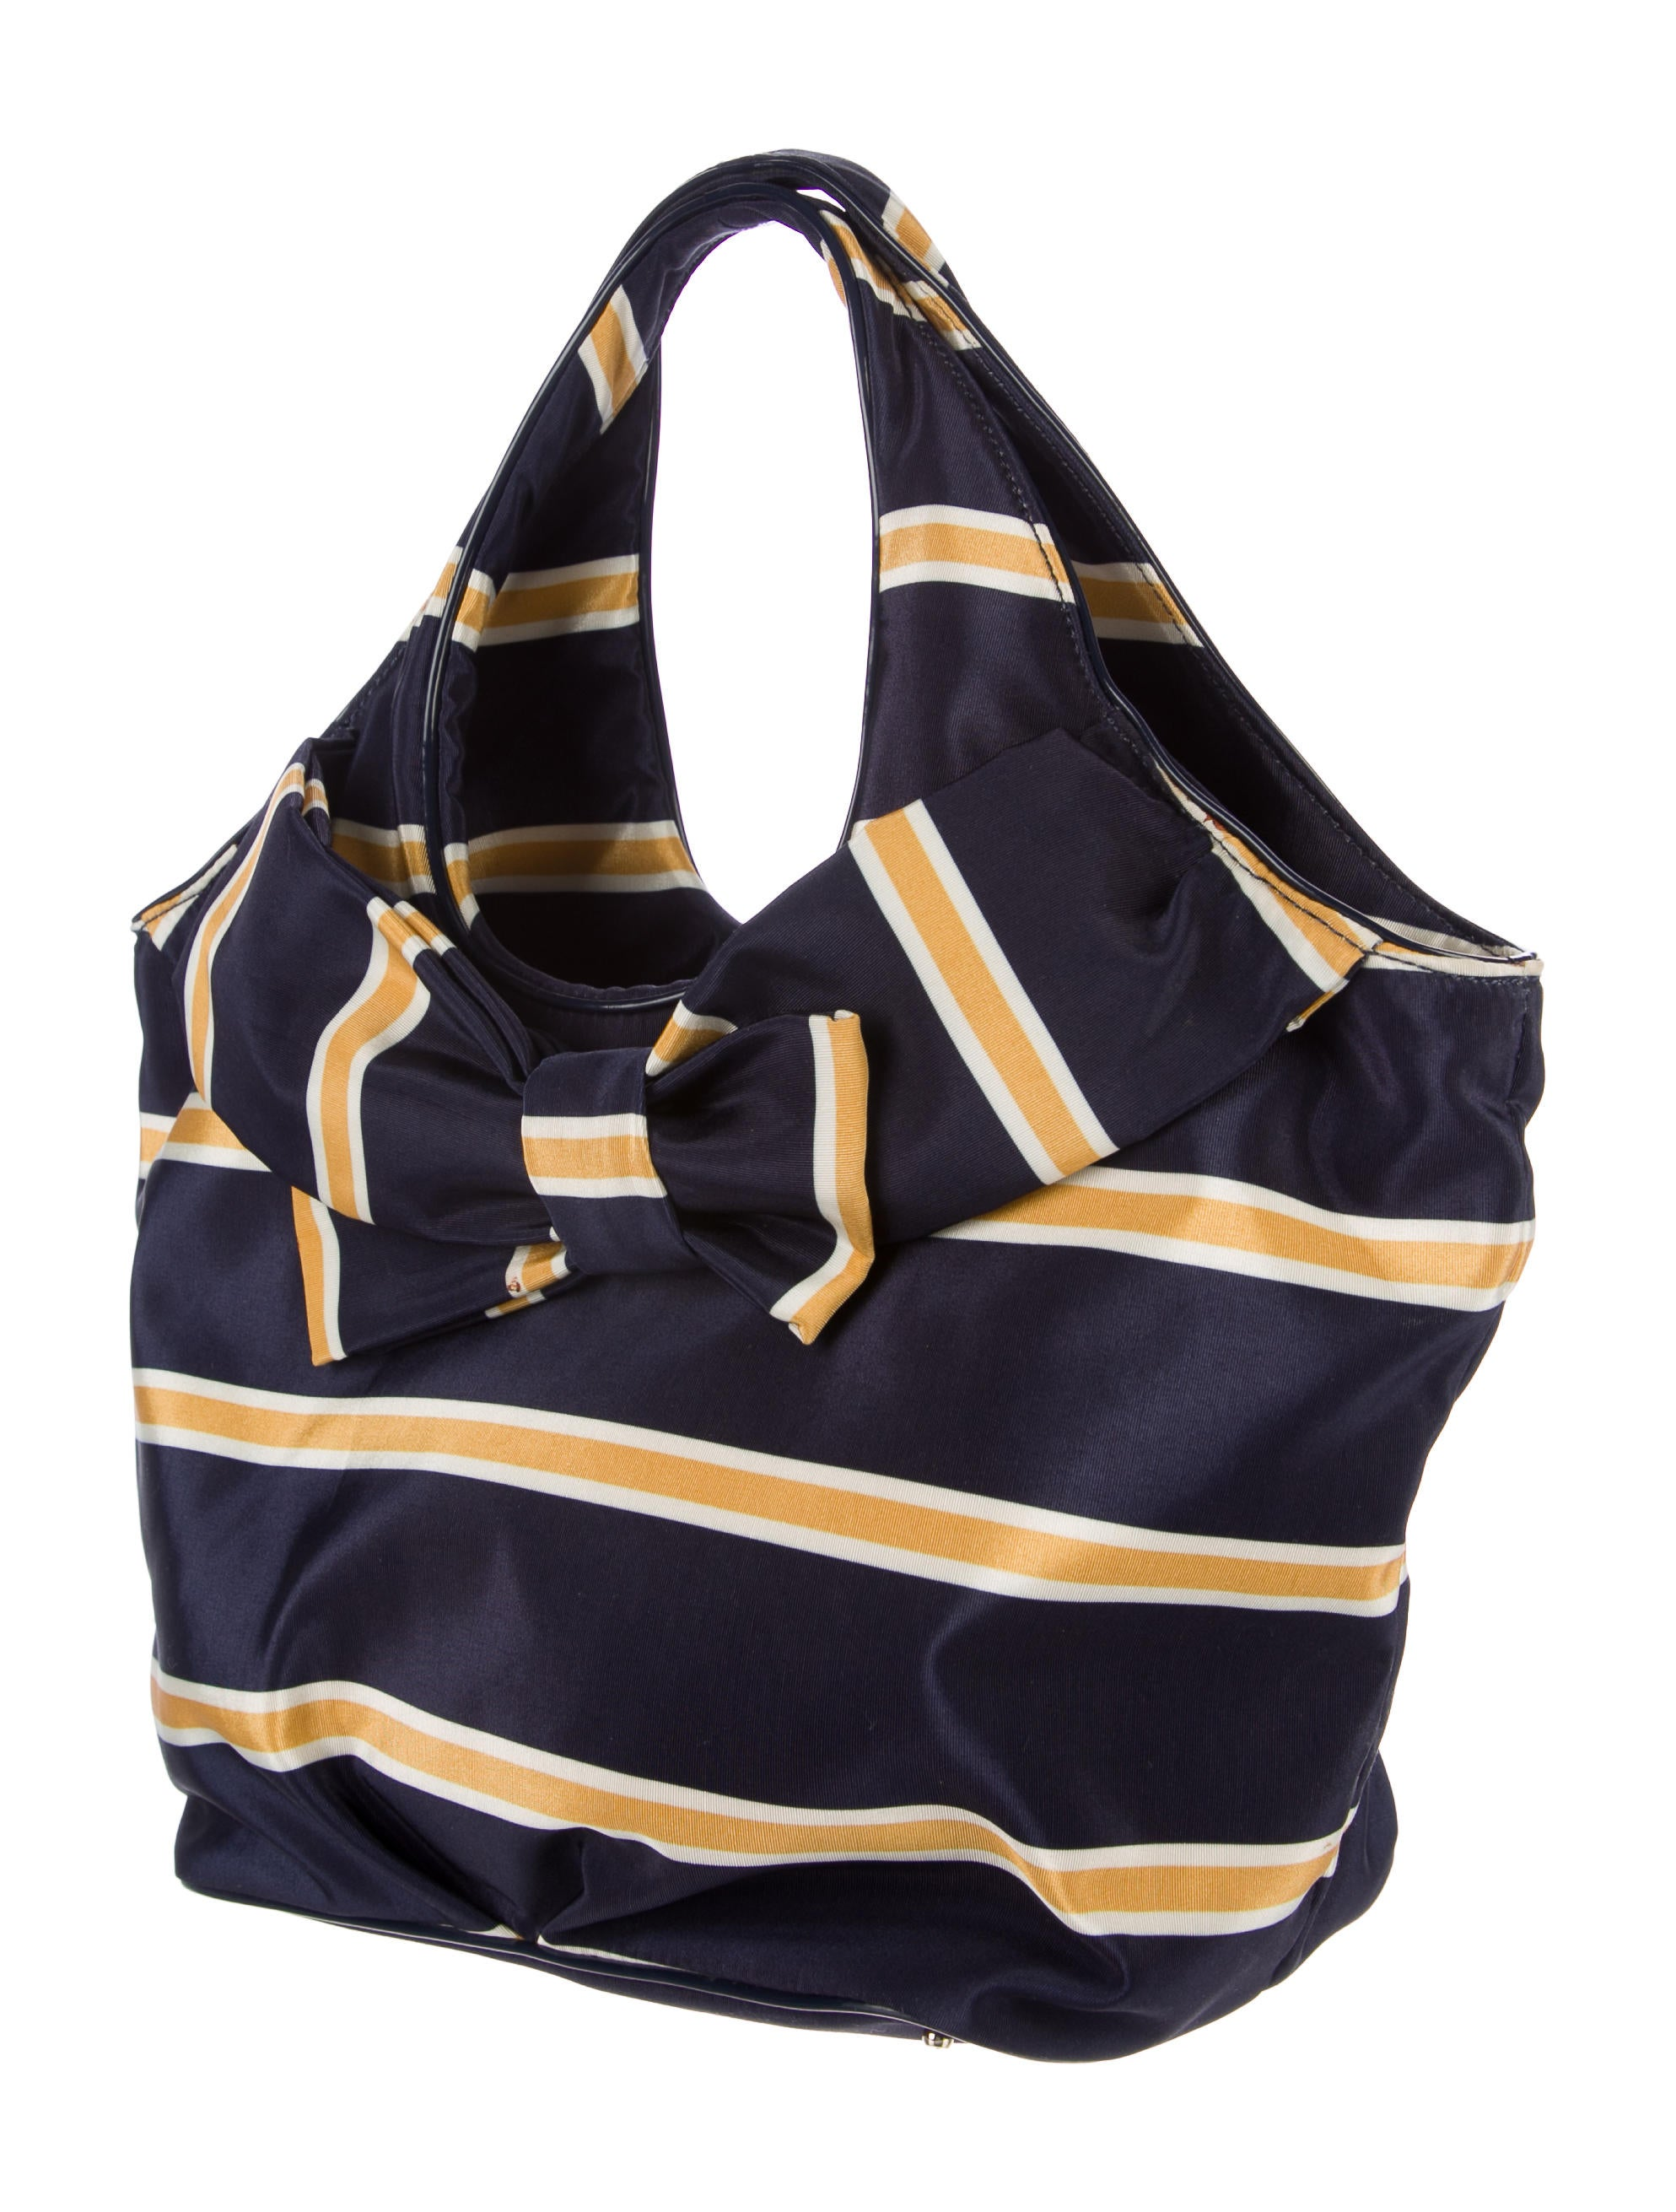 kate spade new york striped bow tote bag handbags wka67294 the realreal. Black Bedroom Furniture Sets. Home Design Ideas